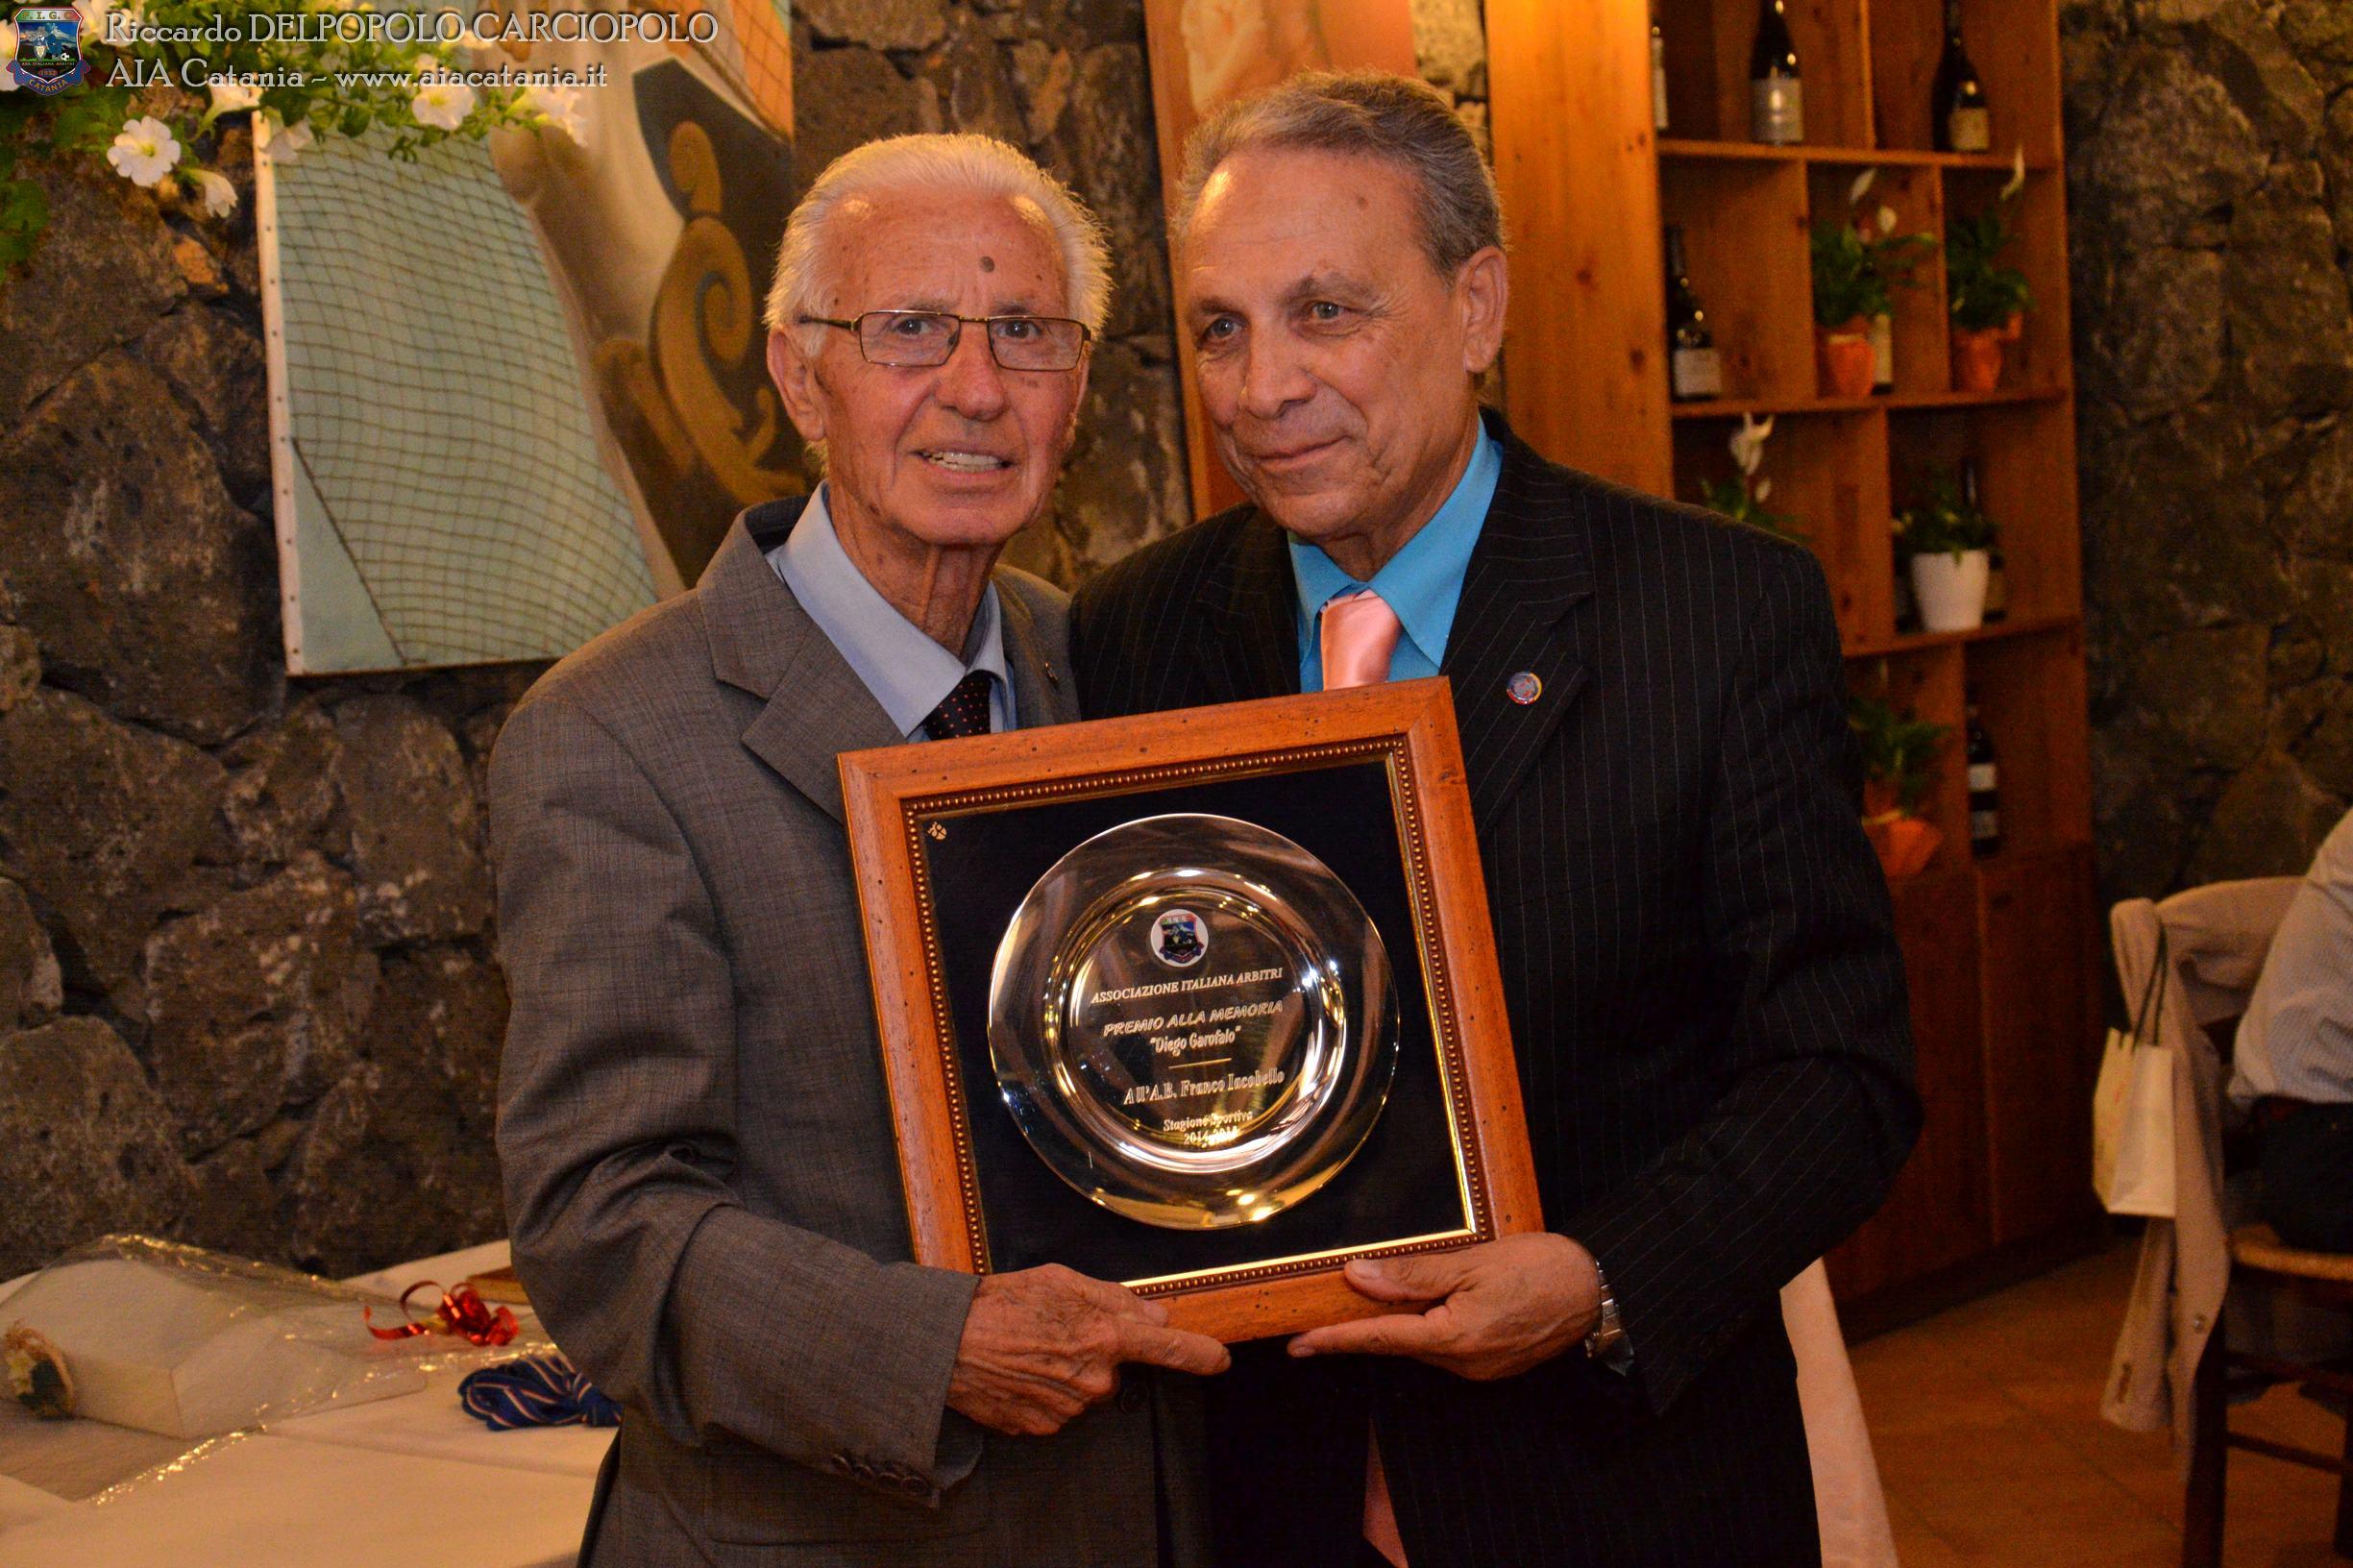 A.B. Francesco IACOBELLO premiato col Premio Diego GAROFALO dal A.B. Rag. Ugo VITTORIA.